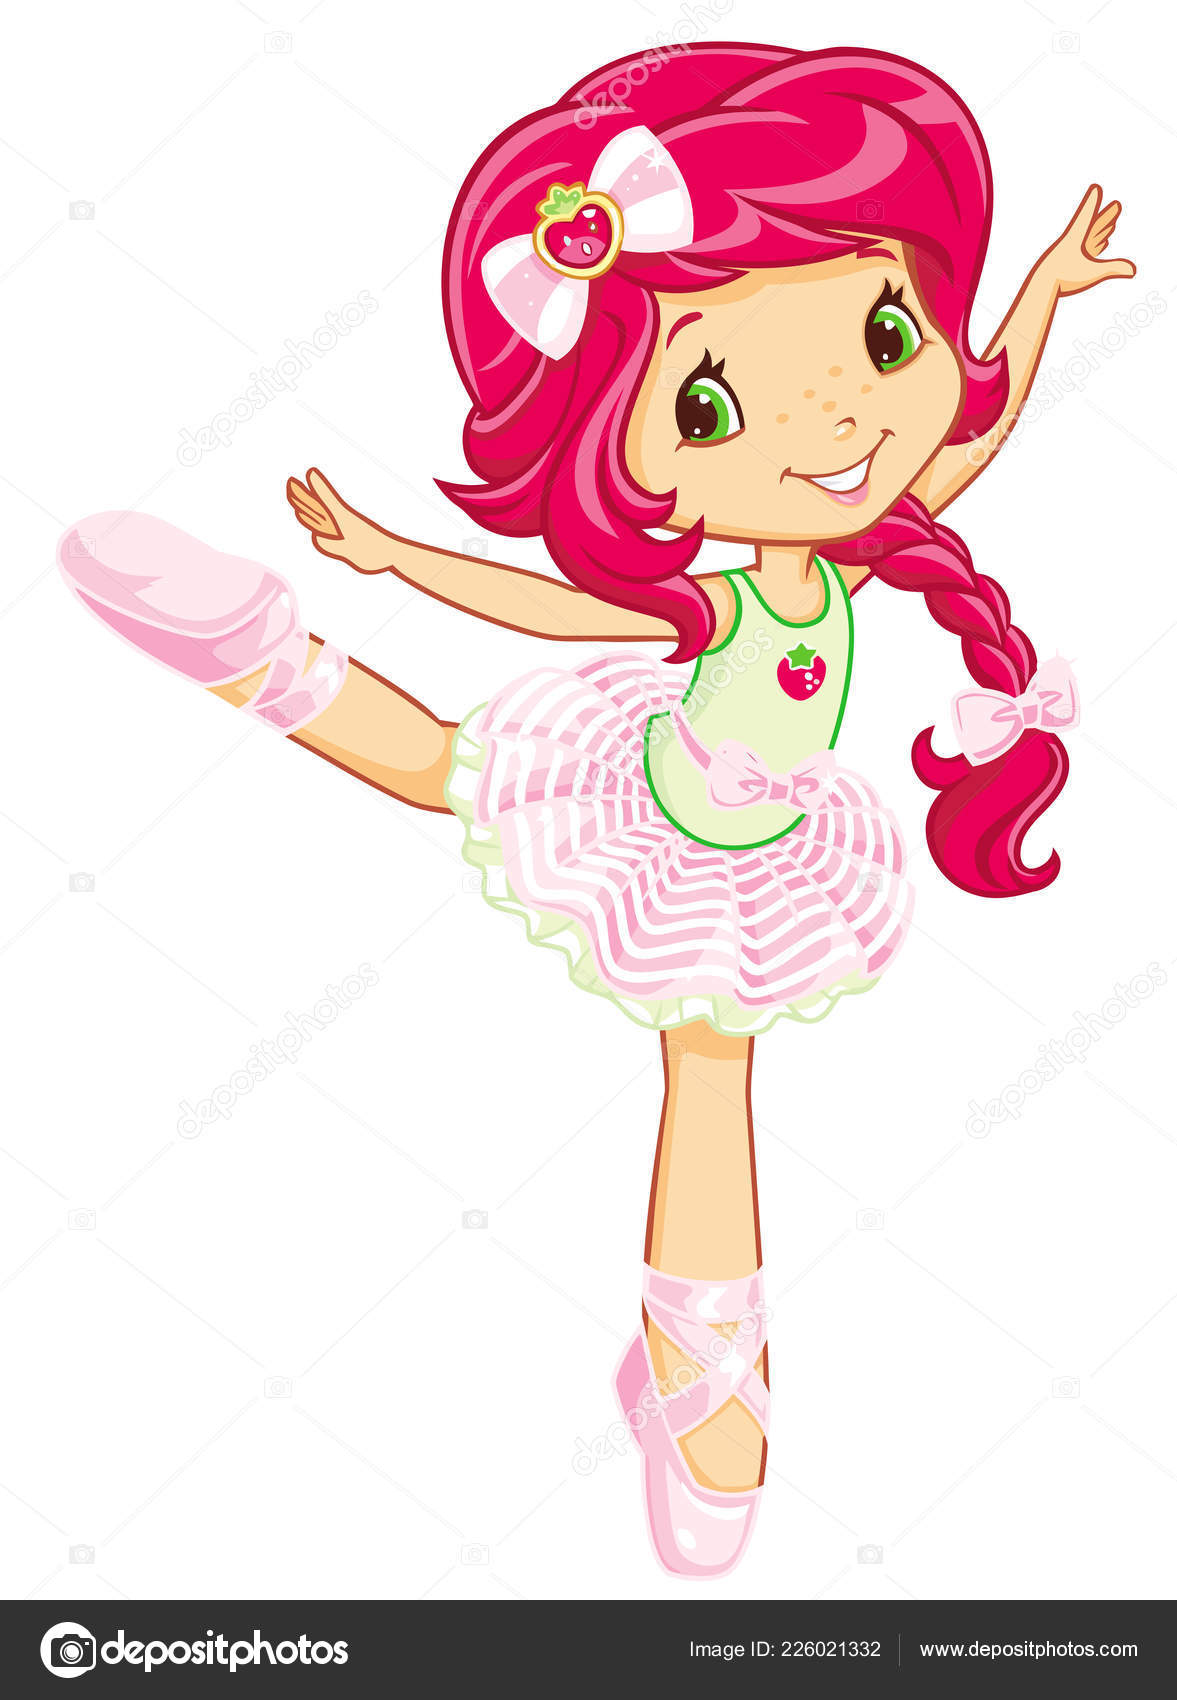 Images Strawberry Shortcake Cartoon Characters Strawberry